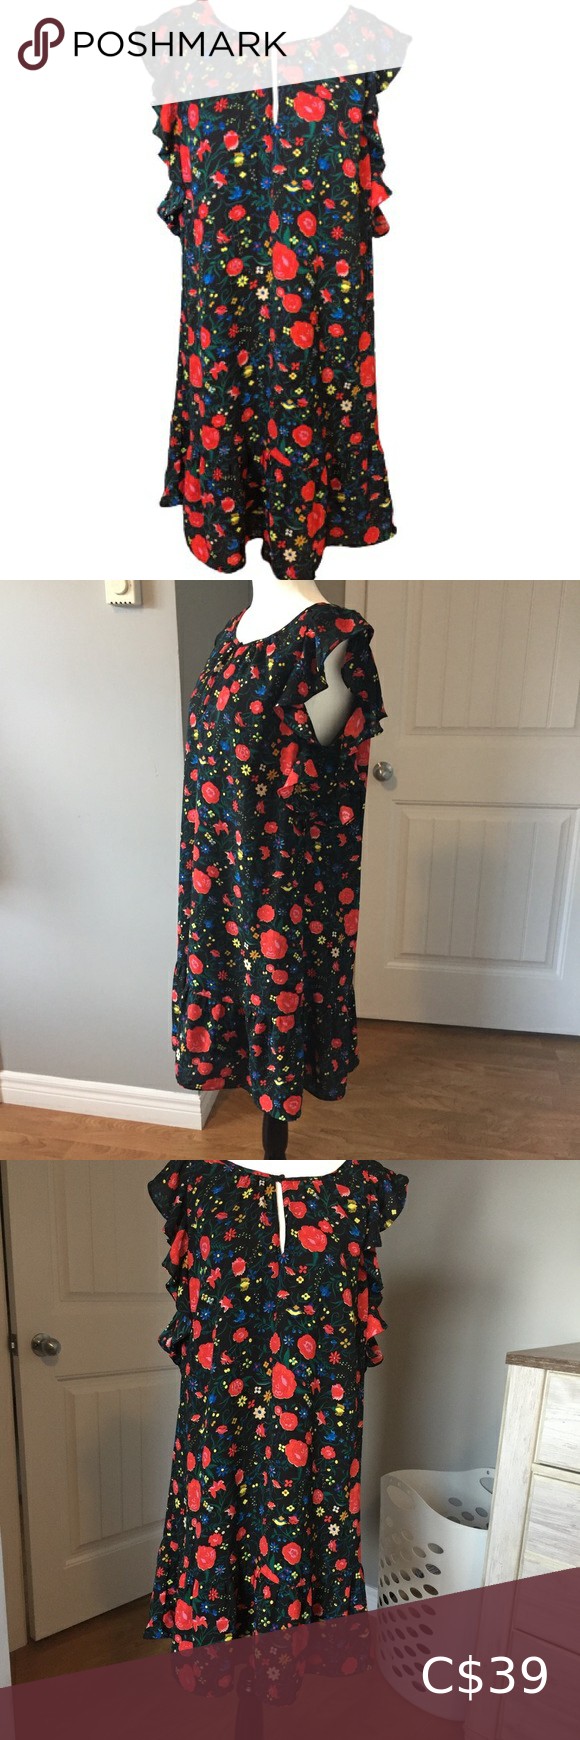 J Crew Floral Mesh Dress